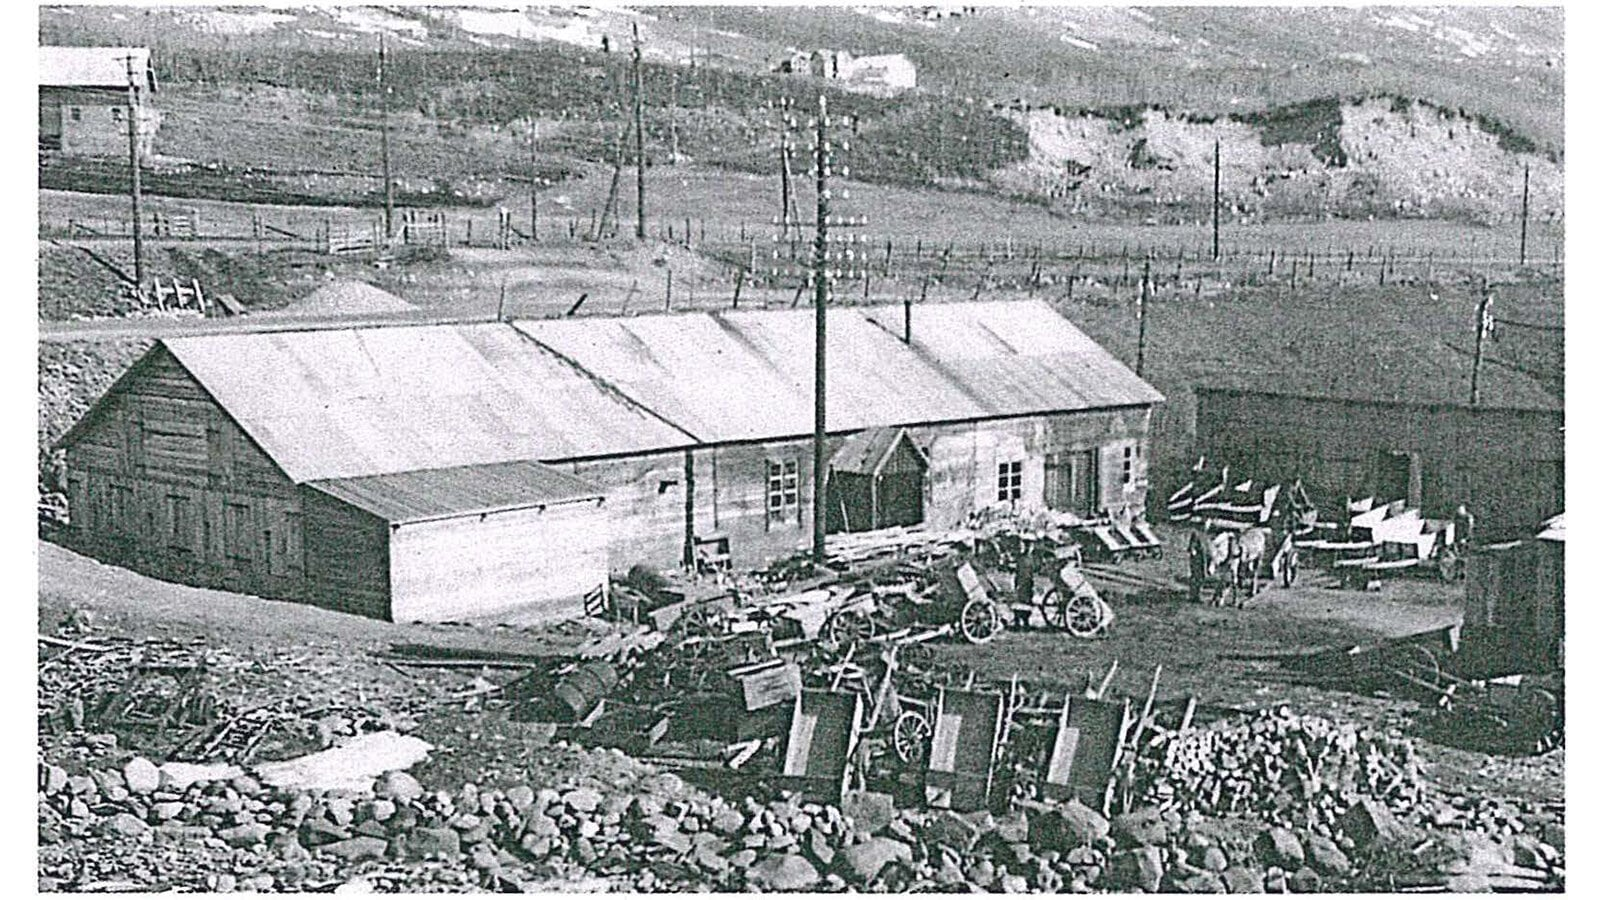 https://www.brusletto.no/pub_docs/files/Bruslettoer125år/Fabrikken-rundt-1930_169.jpg